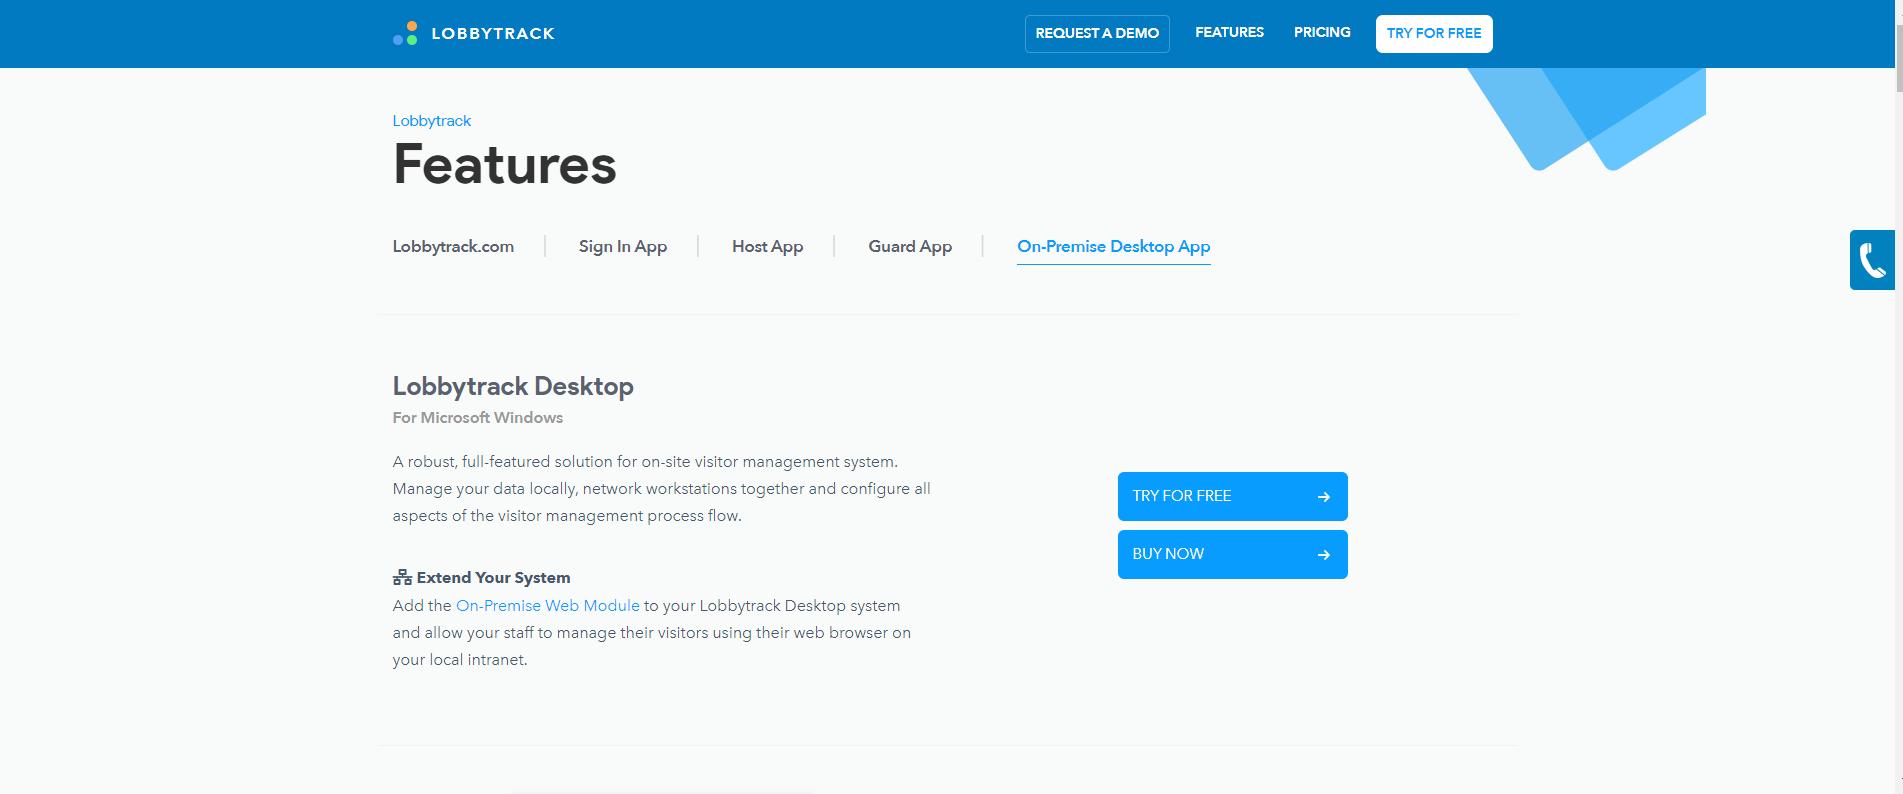 Lobbytrack-Lobbytrack_Desktop_Visitor_Management_Software_and_Systems